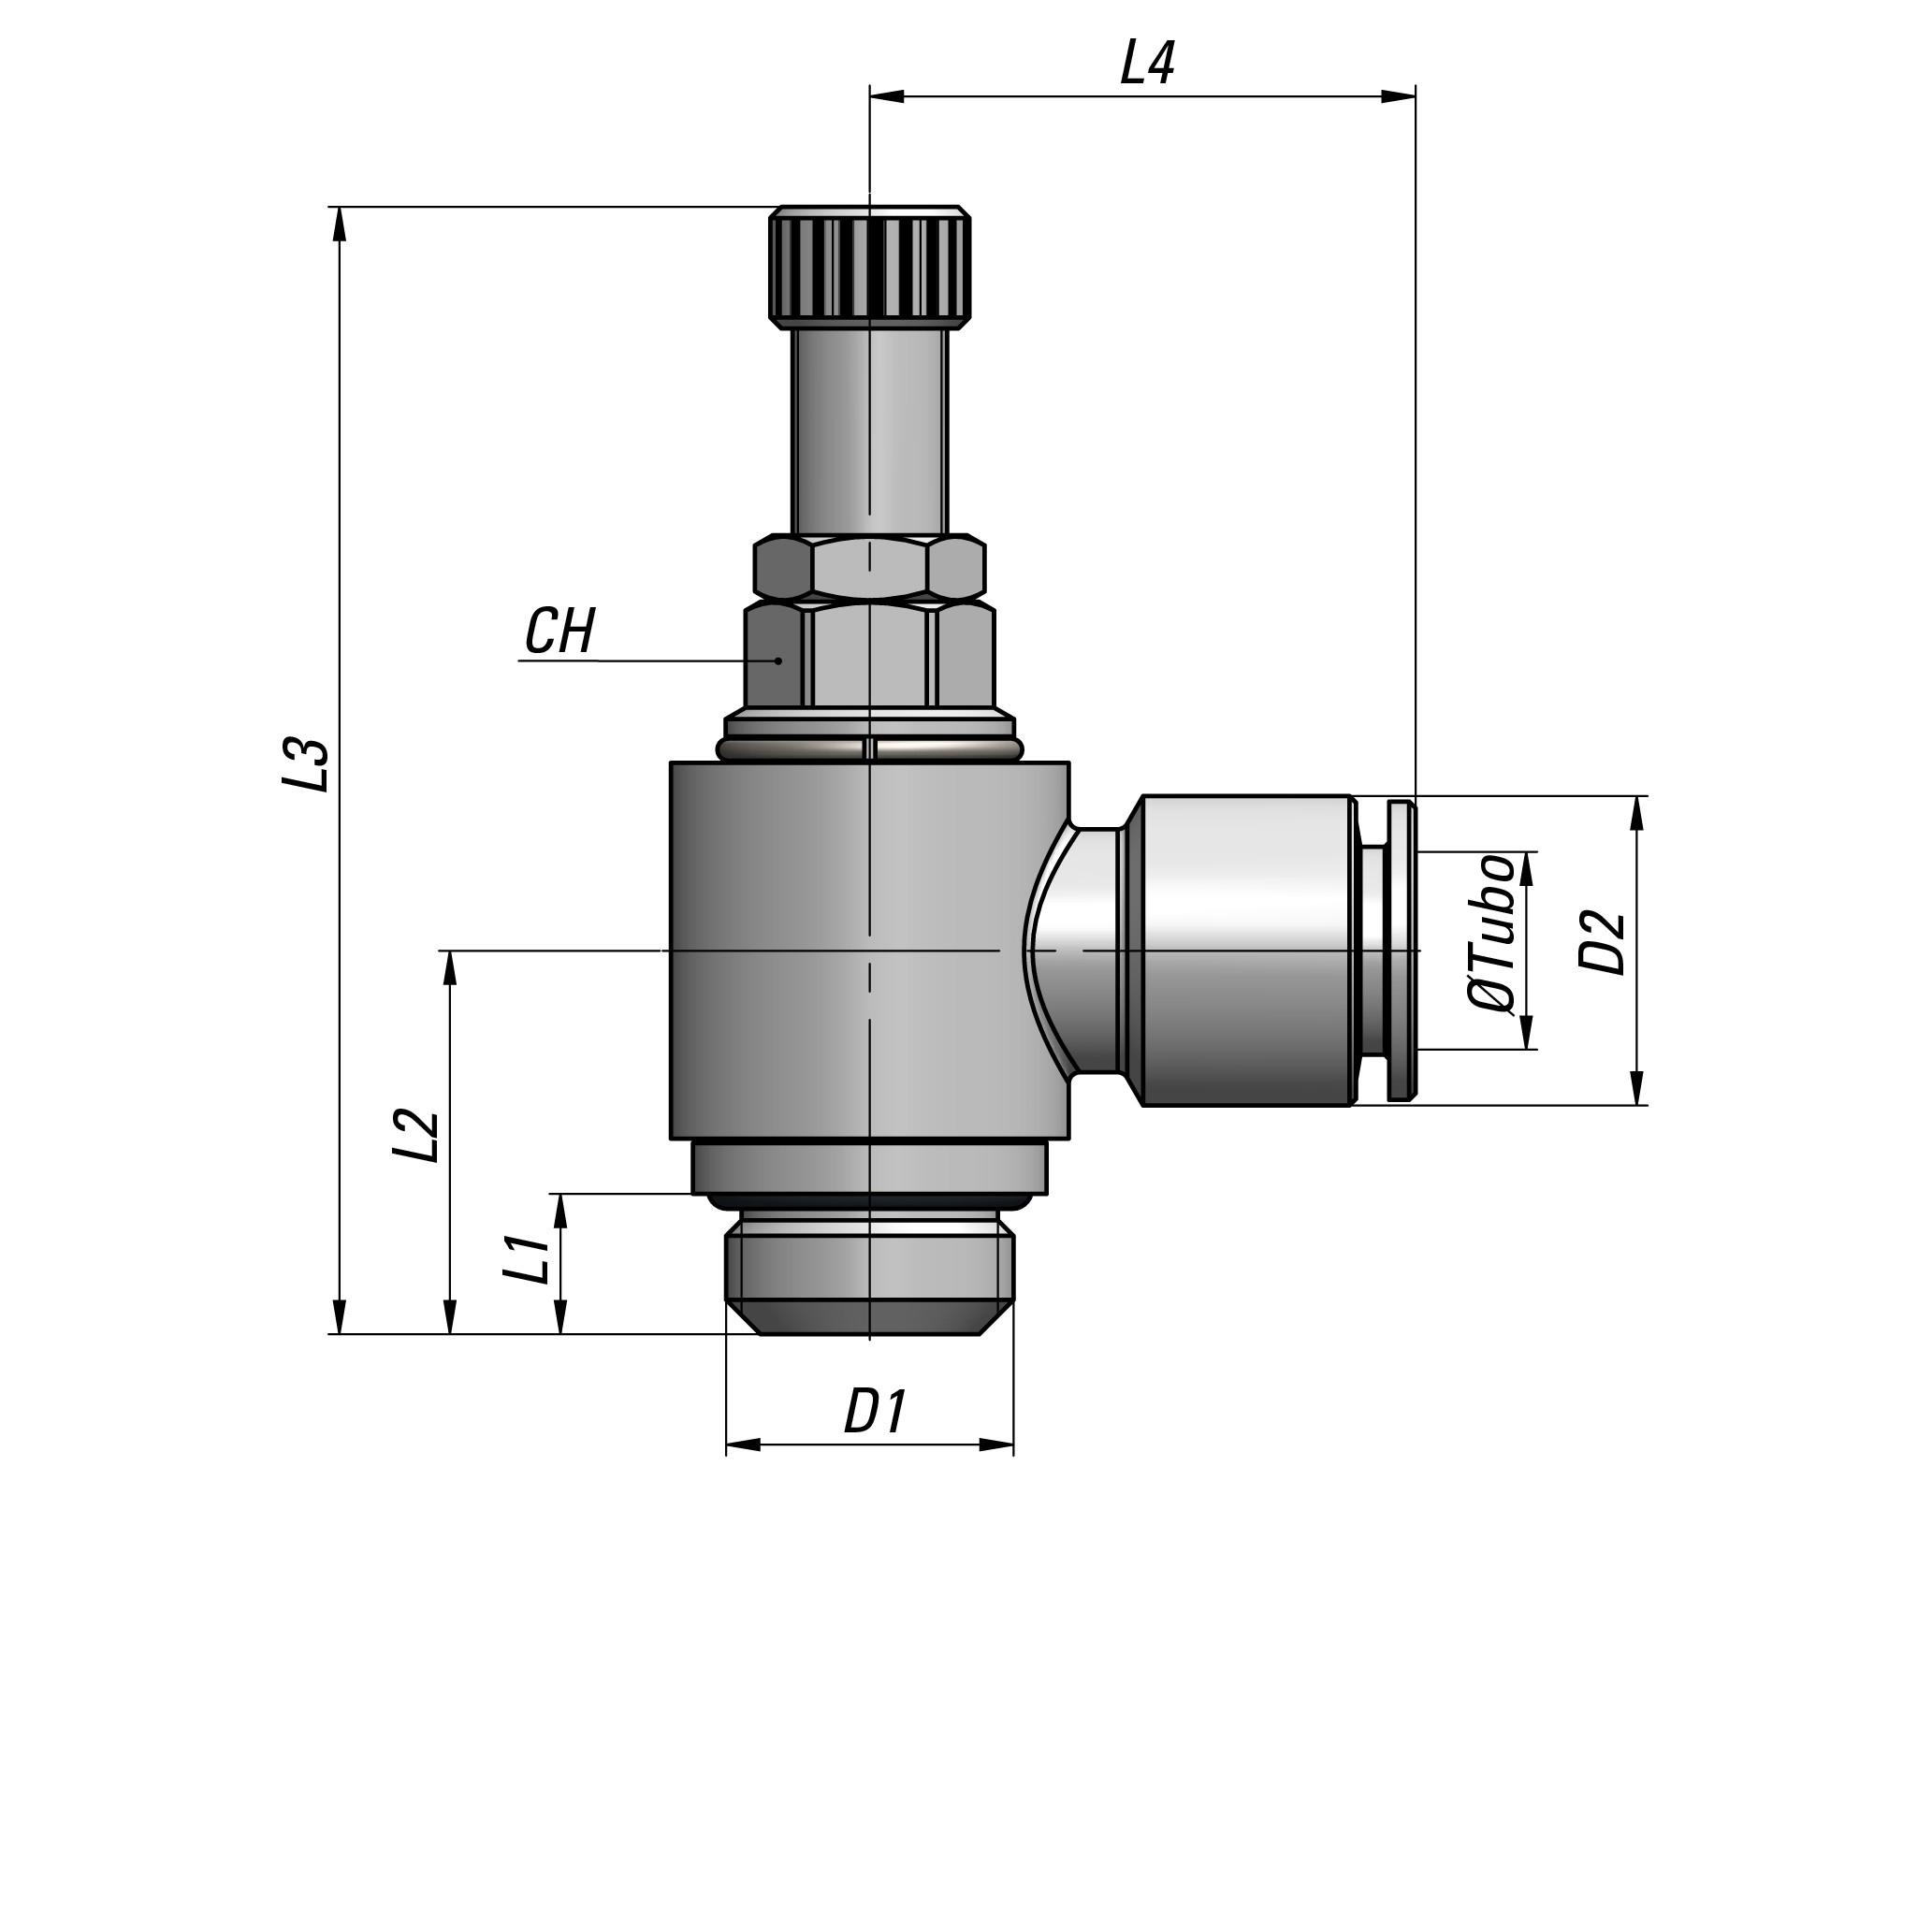 MV41 06 14 /V